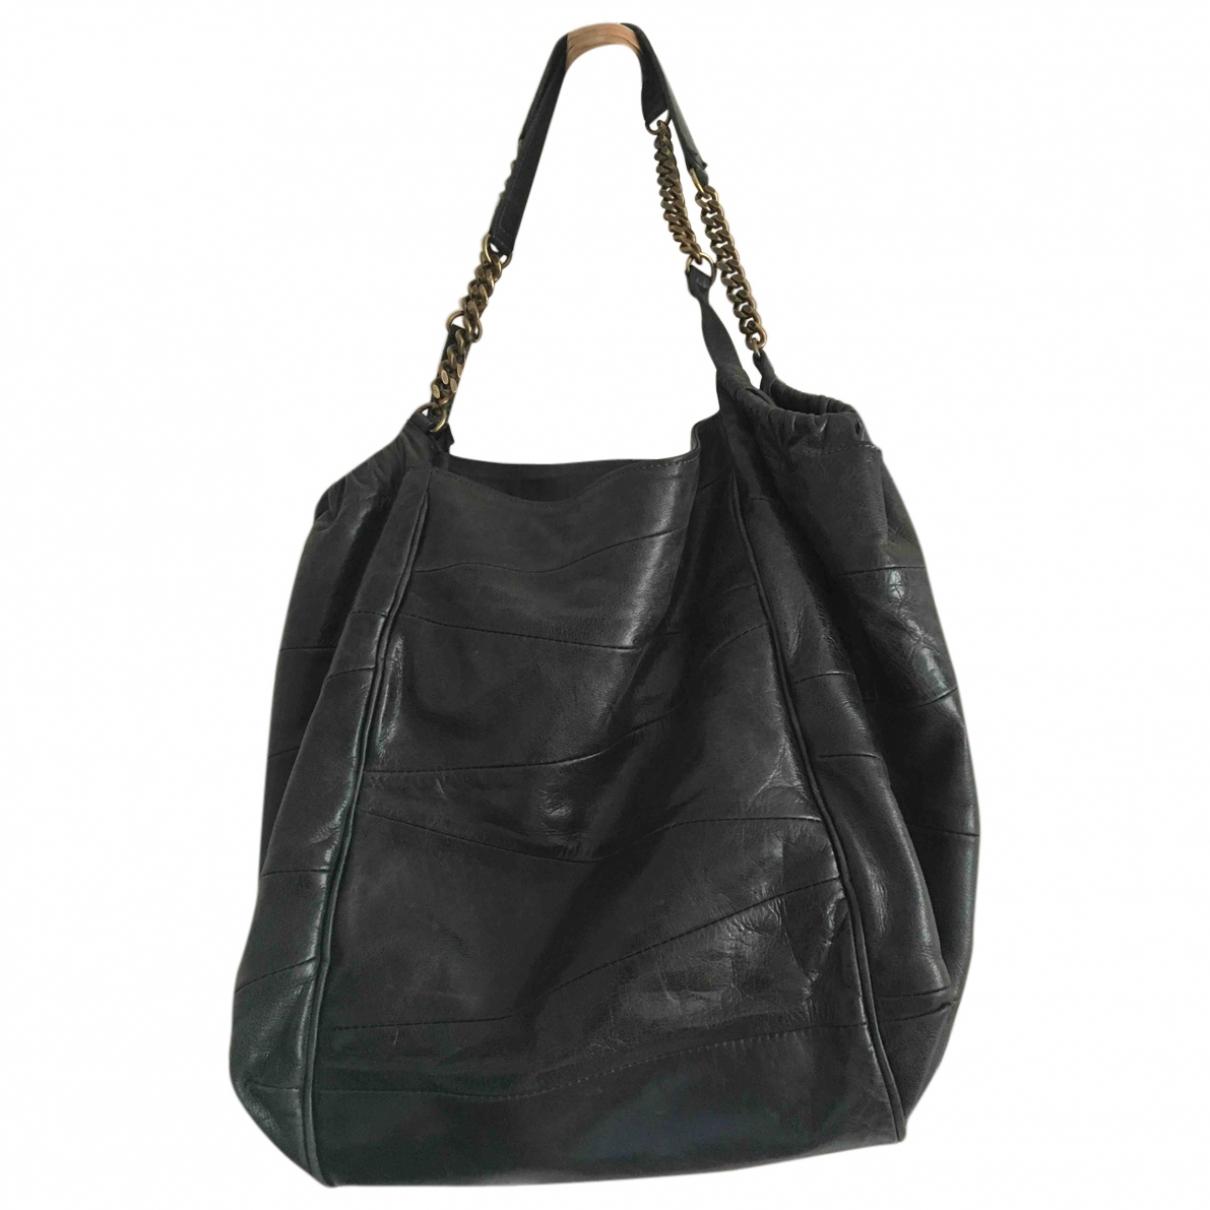 Gerard Darel Simple Bag Handtasche in  Khaki Leder